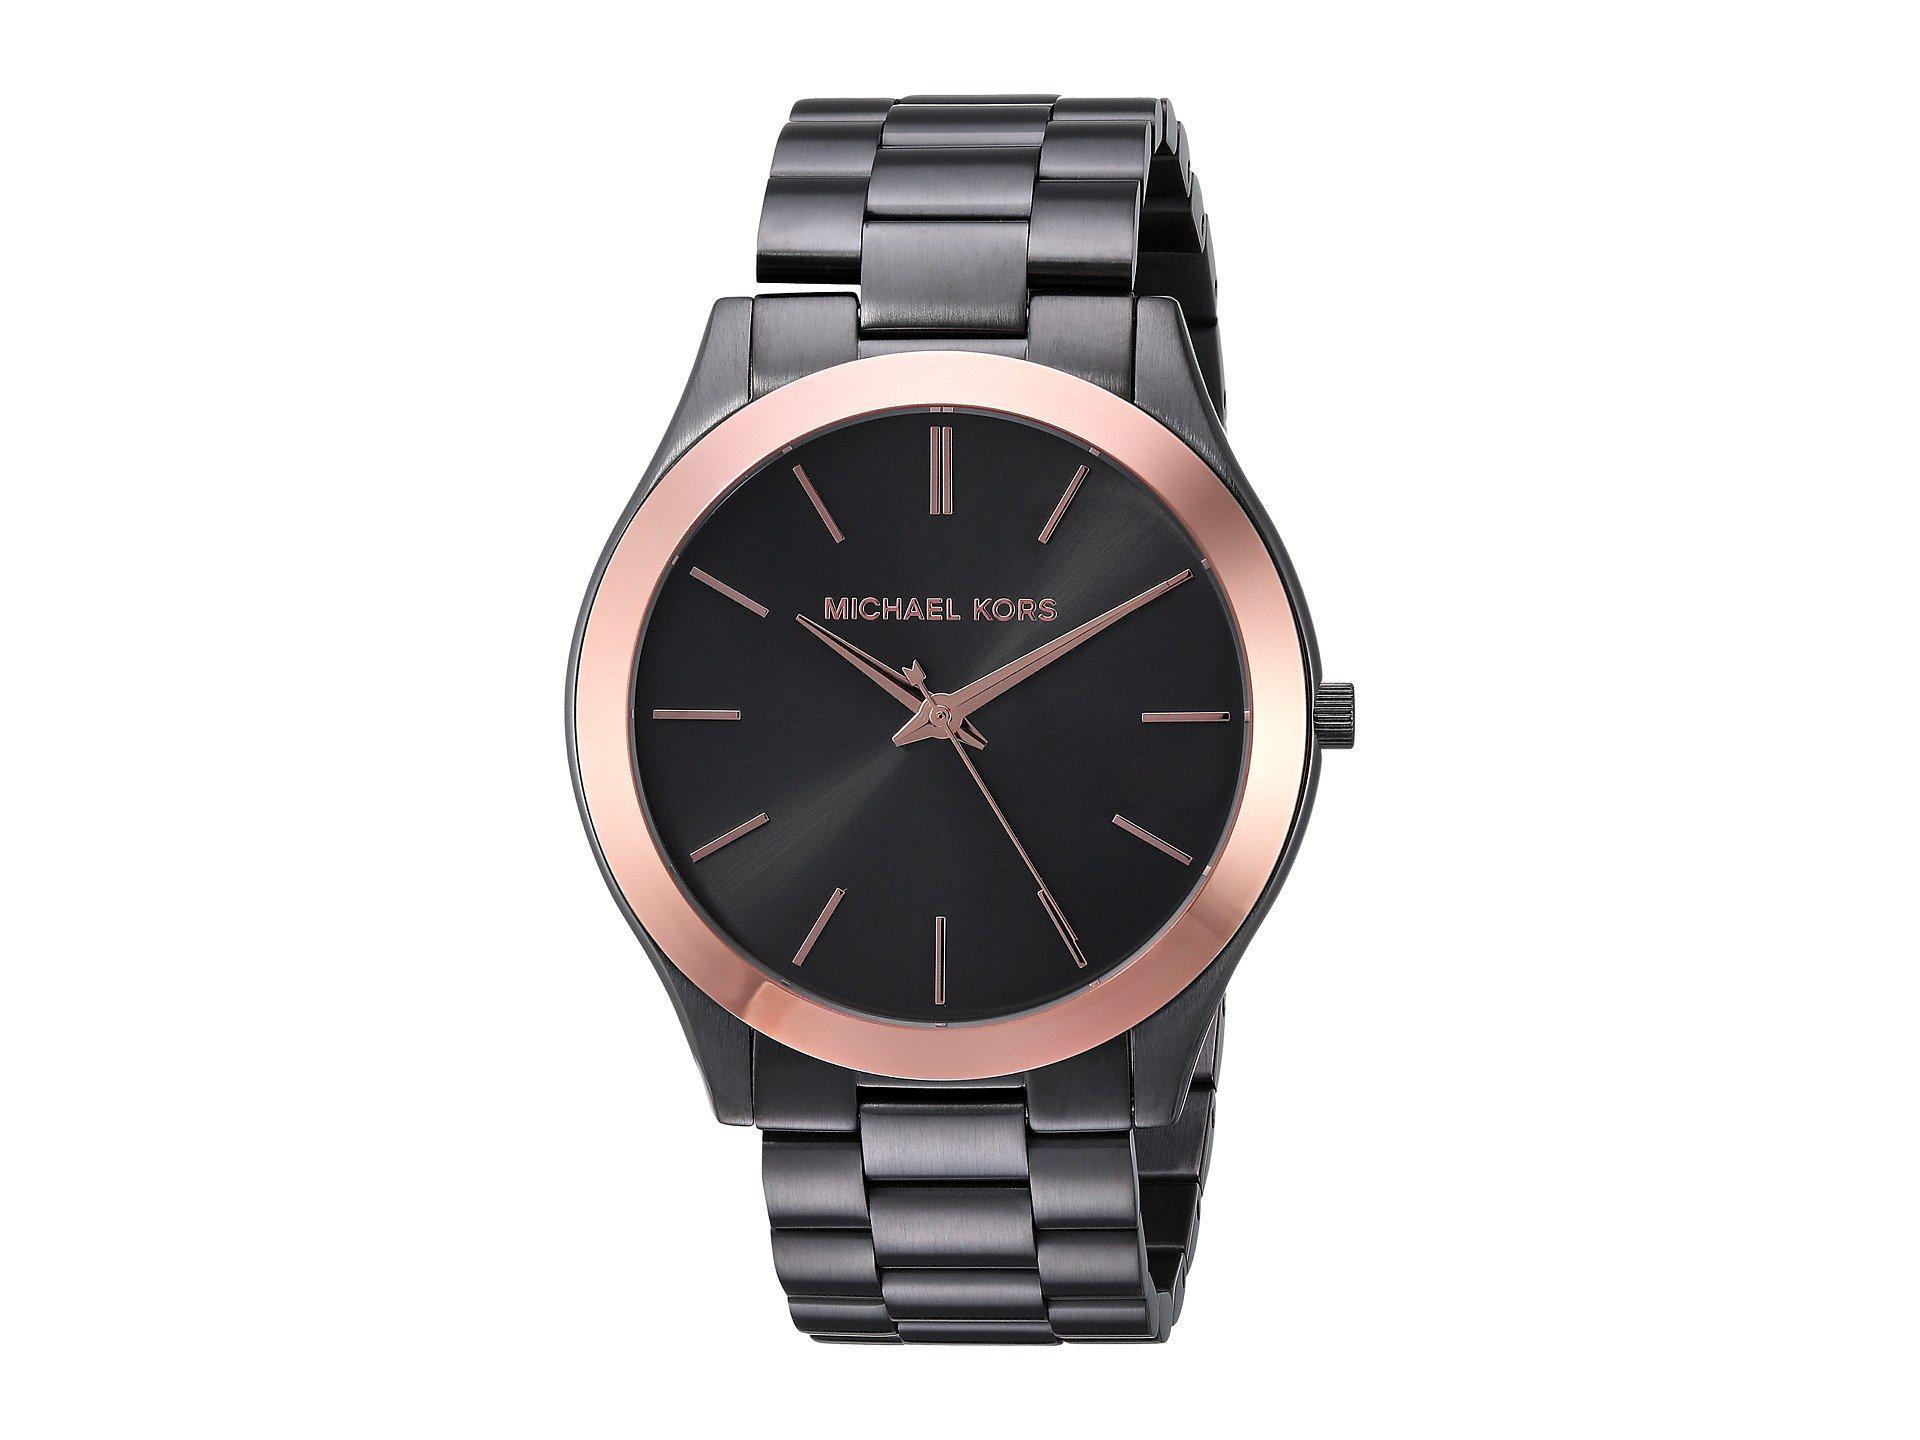 886a9a350028ec Michael Kors Mk8576 - Slim Runway (grey) Watches in Gray for Men - Lyst